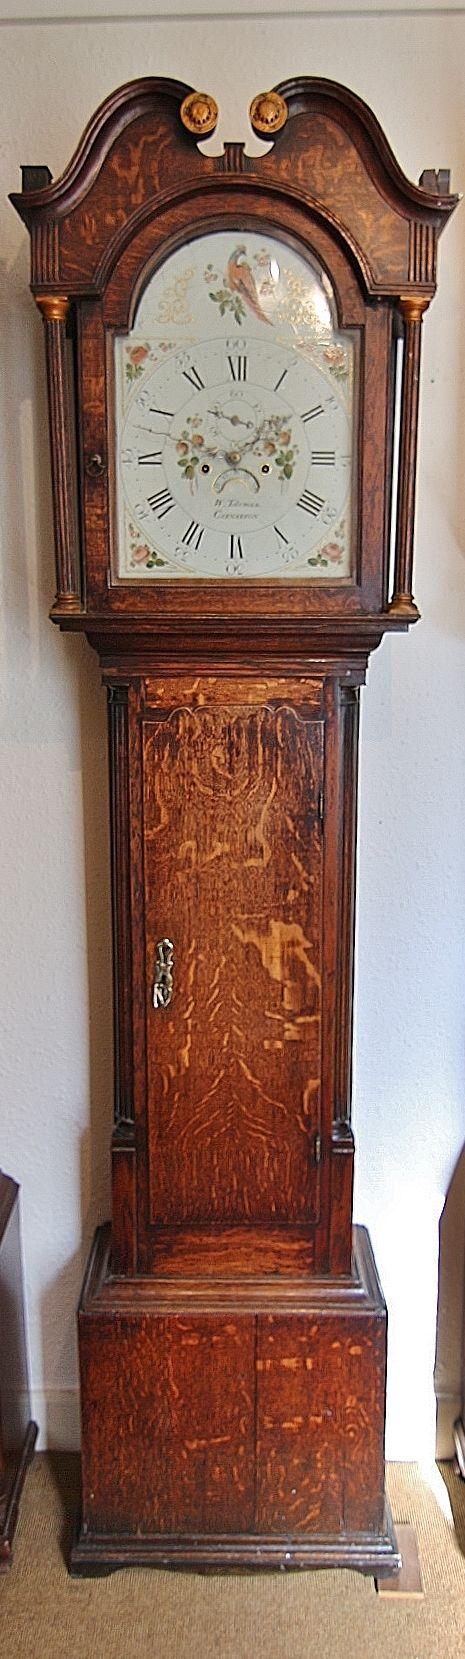 19th century welsh arch dial 8 day longcase clock ' toleman caernarfon'